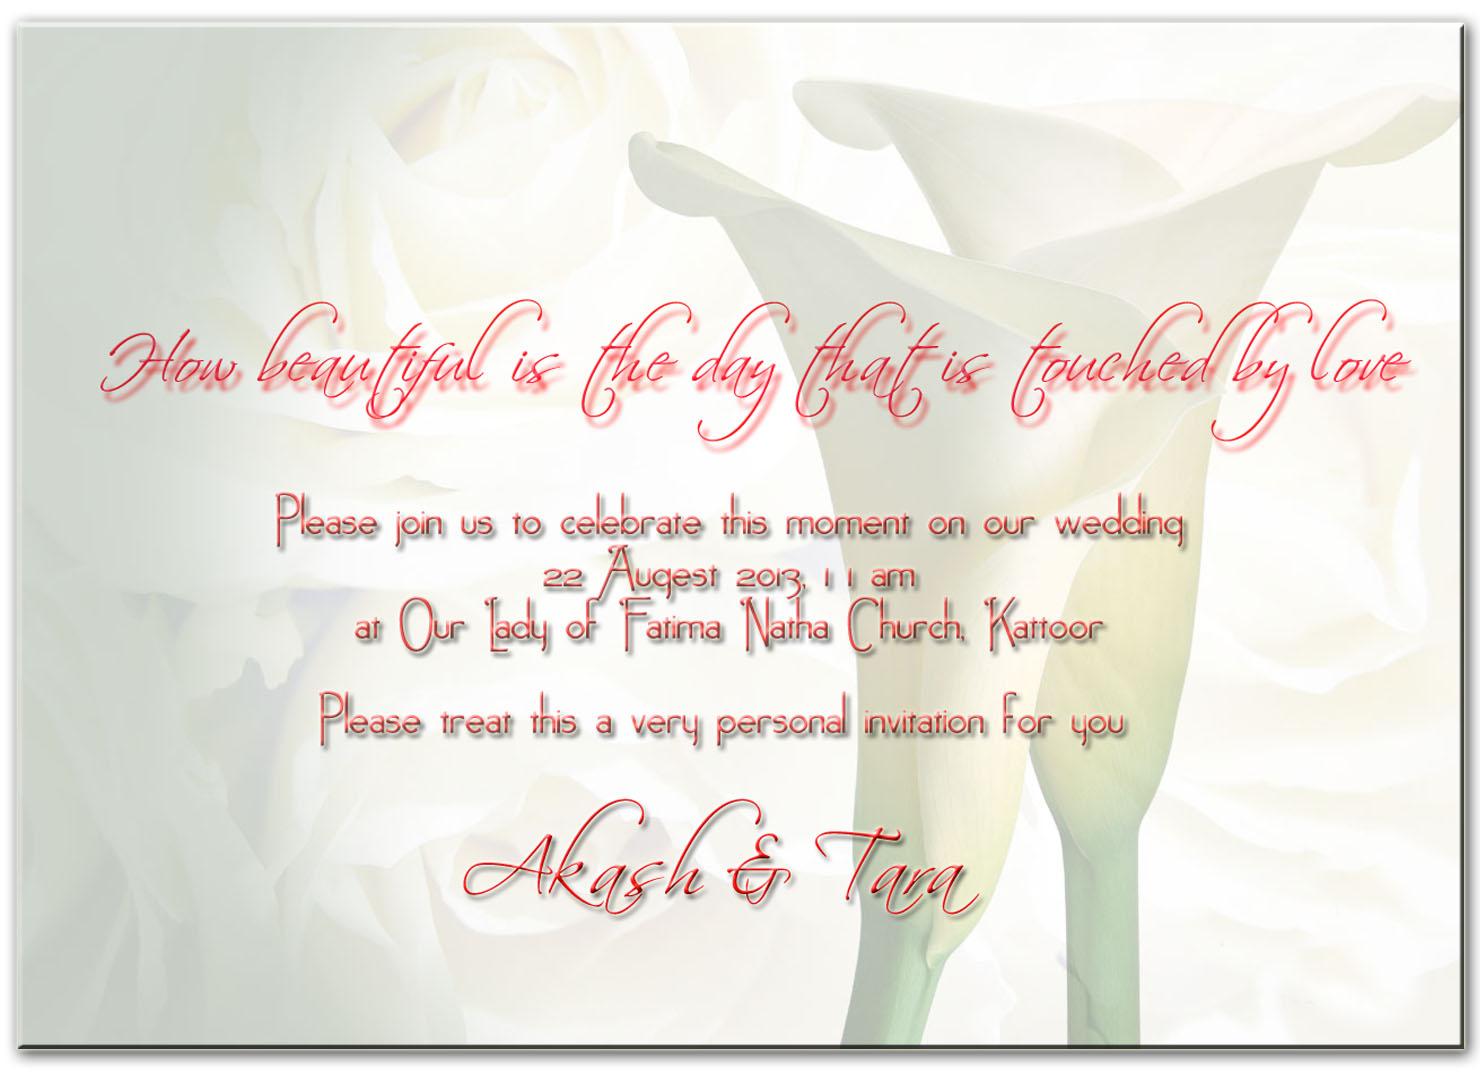 Greetings lappakkarans family blog akash tara wedding kristyandbryce Image collections